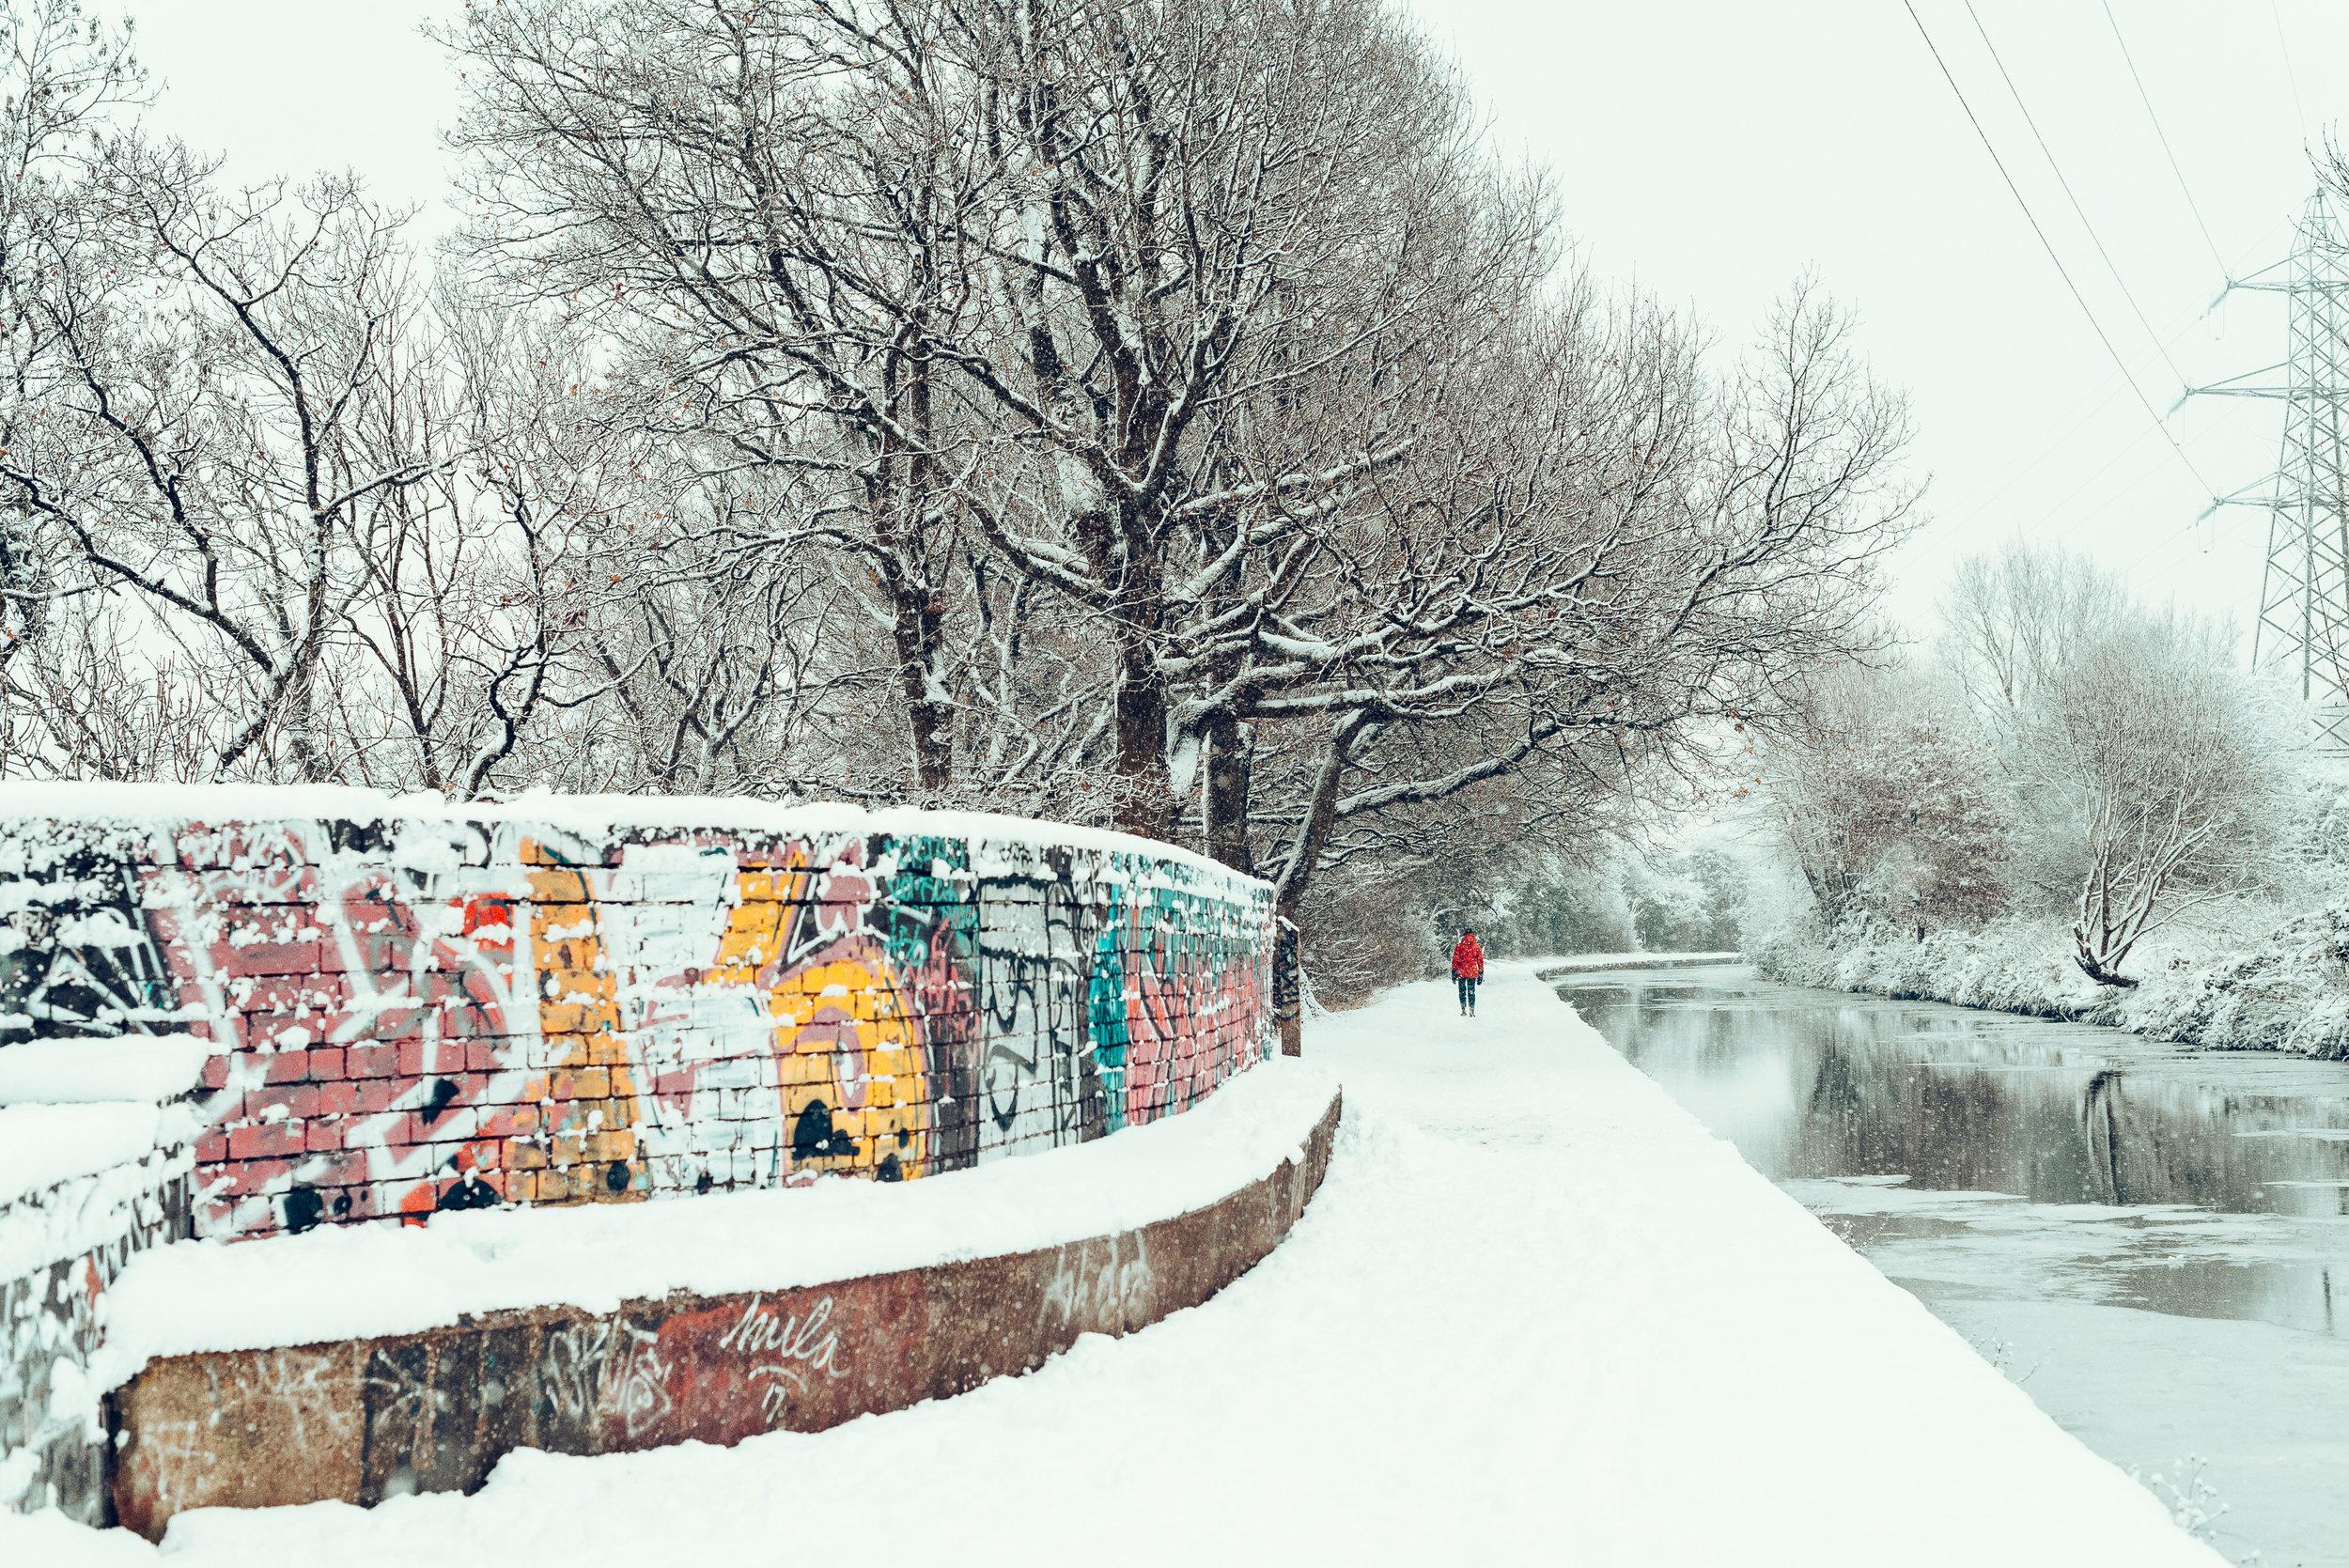 Birmingham-Snow-20171210-0023-Hanny-Foxhall.jpg